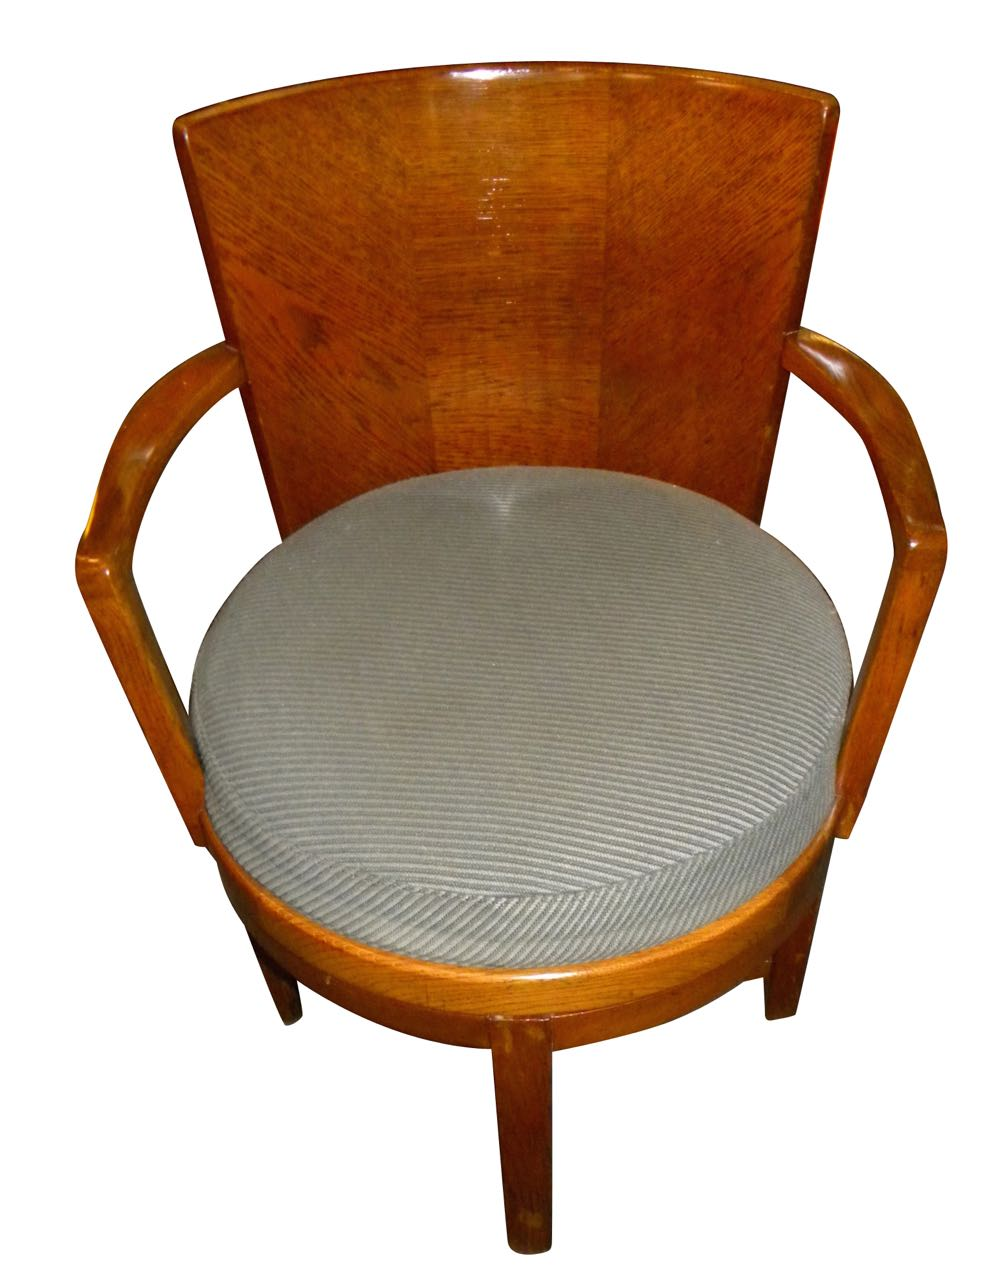 Art deco style chairs - Original Art Deco Swivel Oak Desk Chair